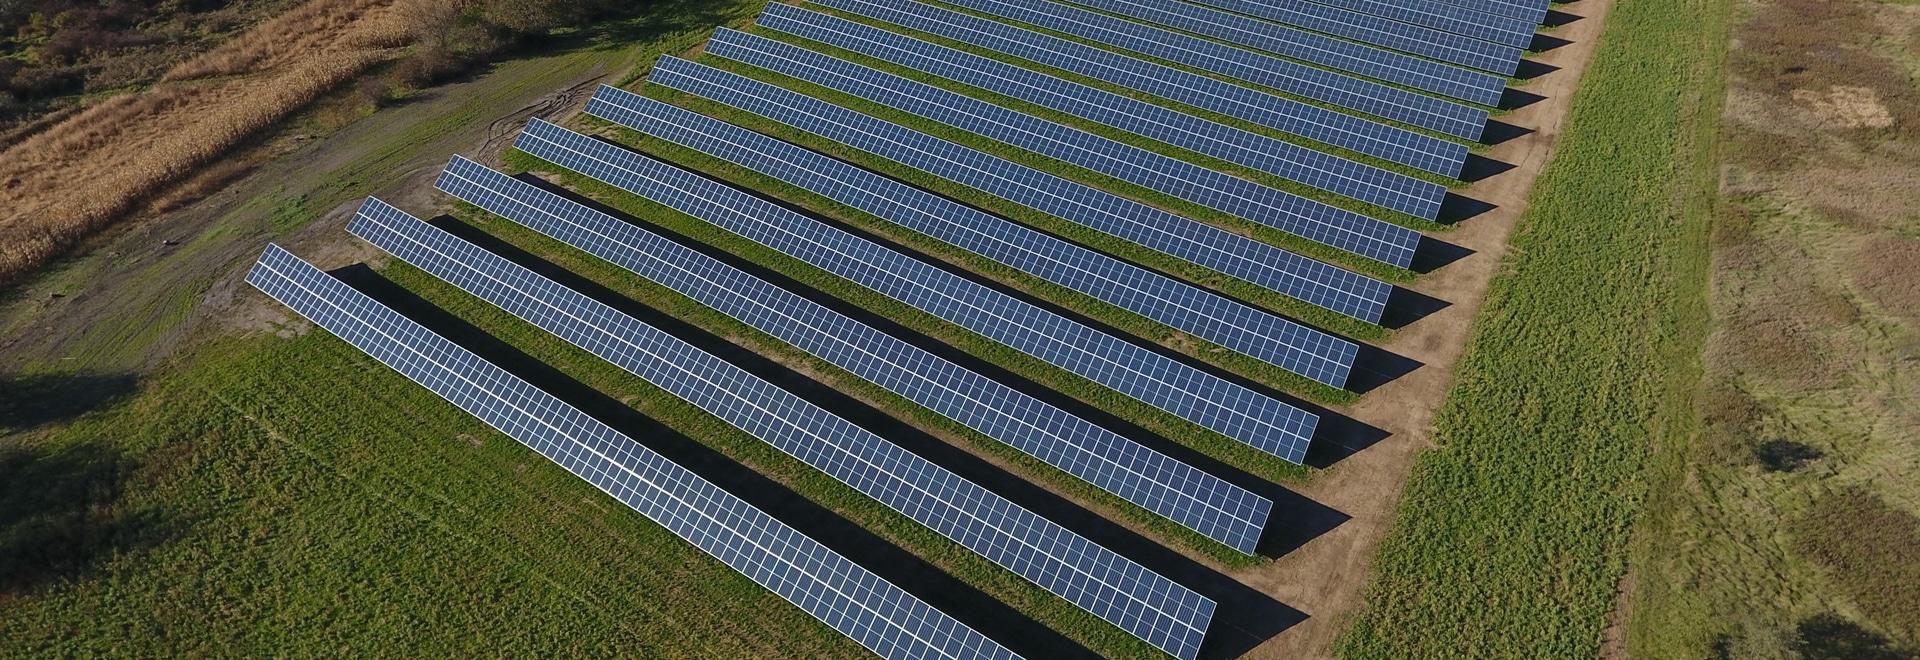 Solar installation success in Michigan